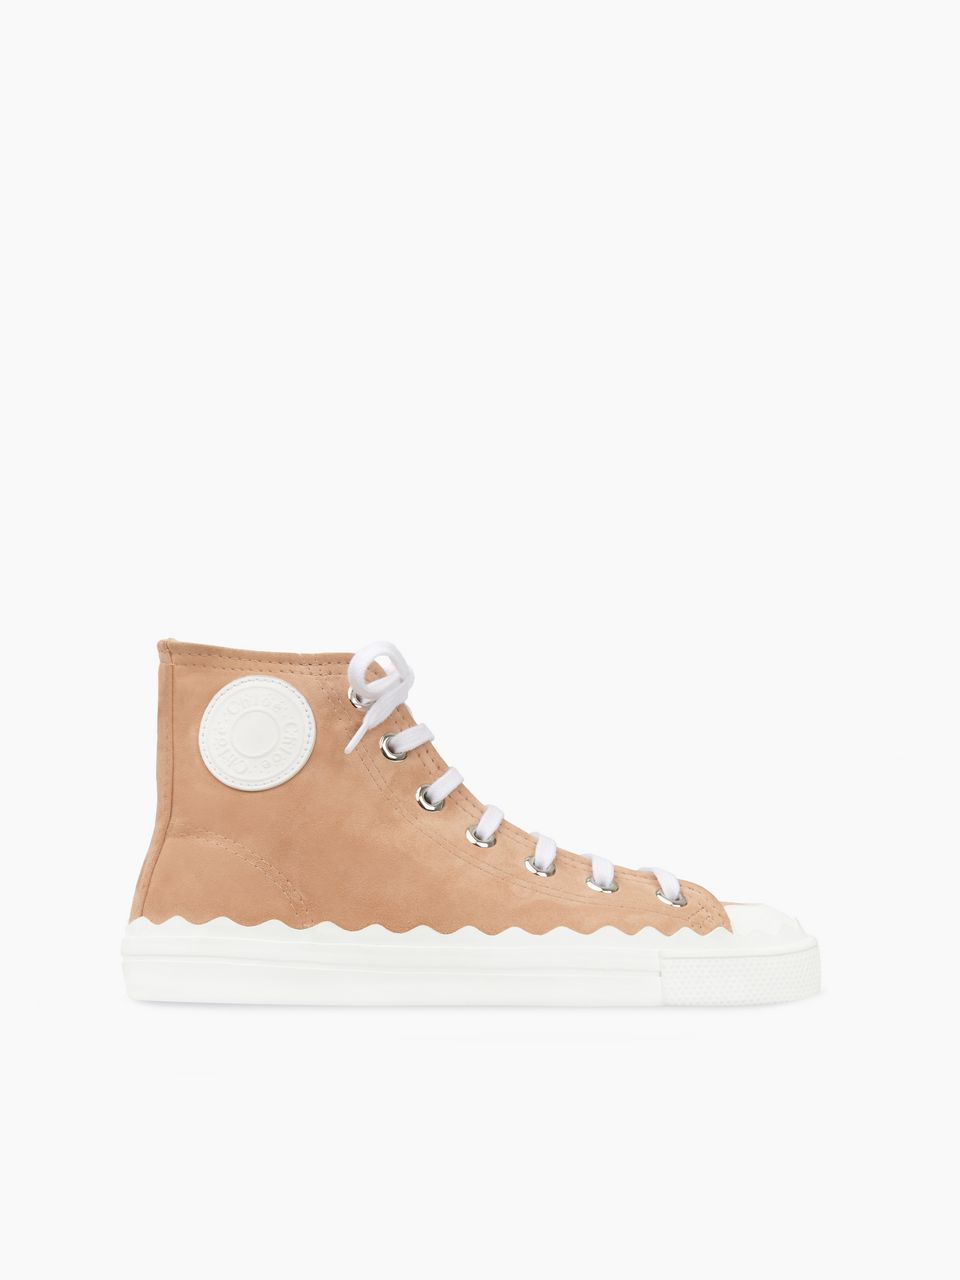 Kyle Sneaker   Tan